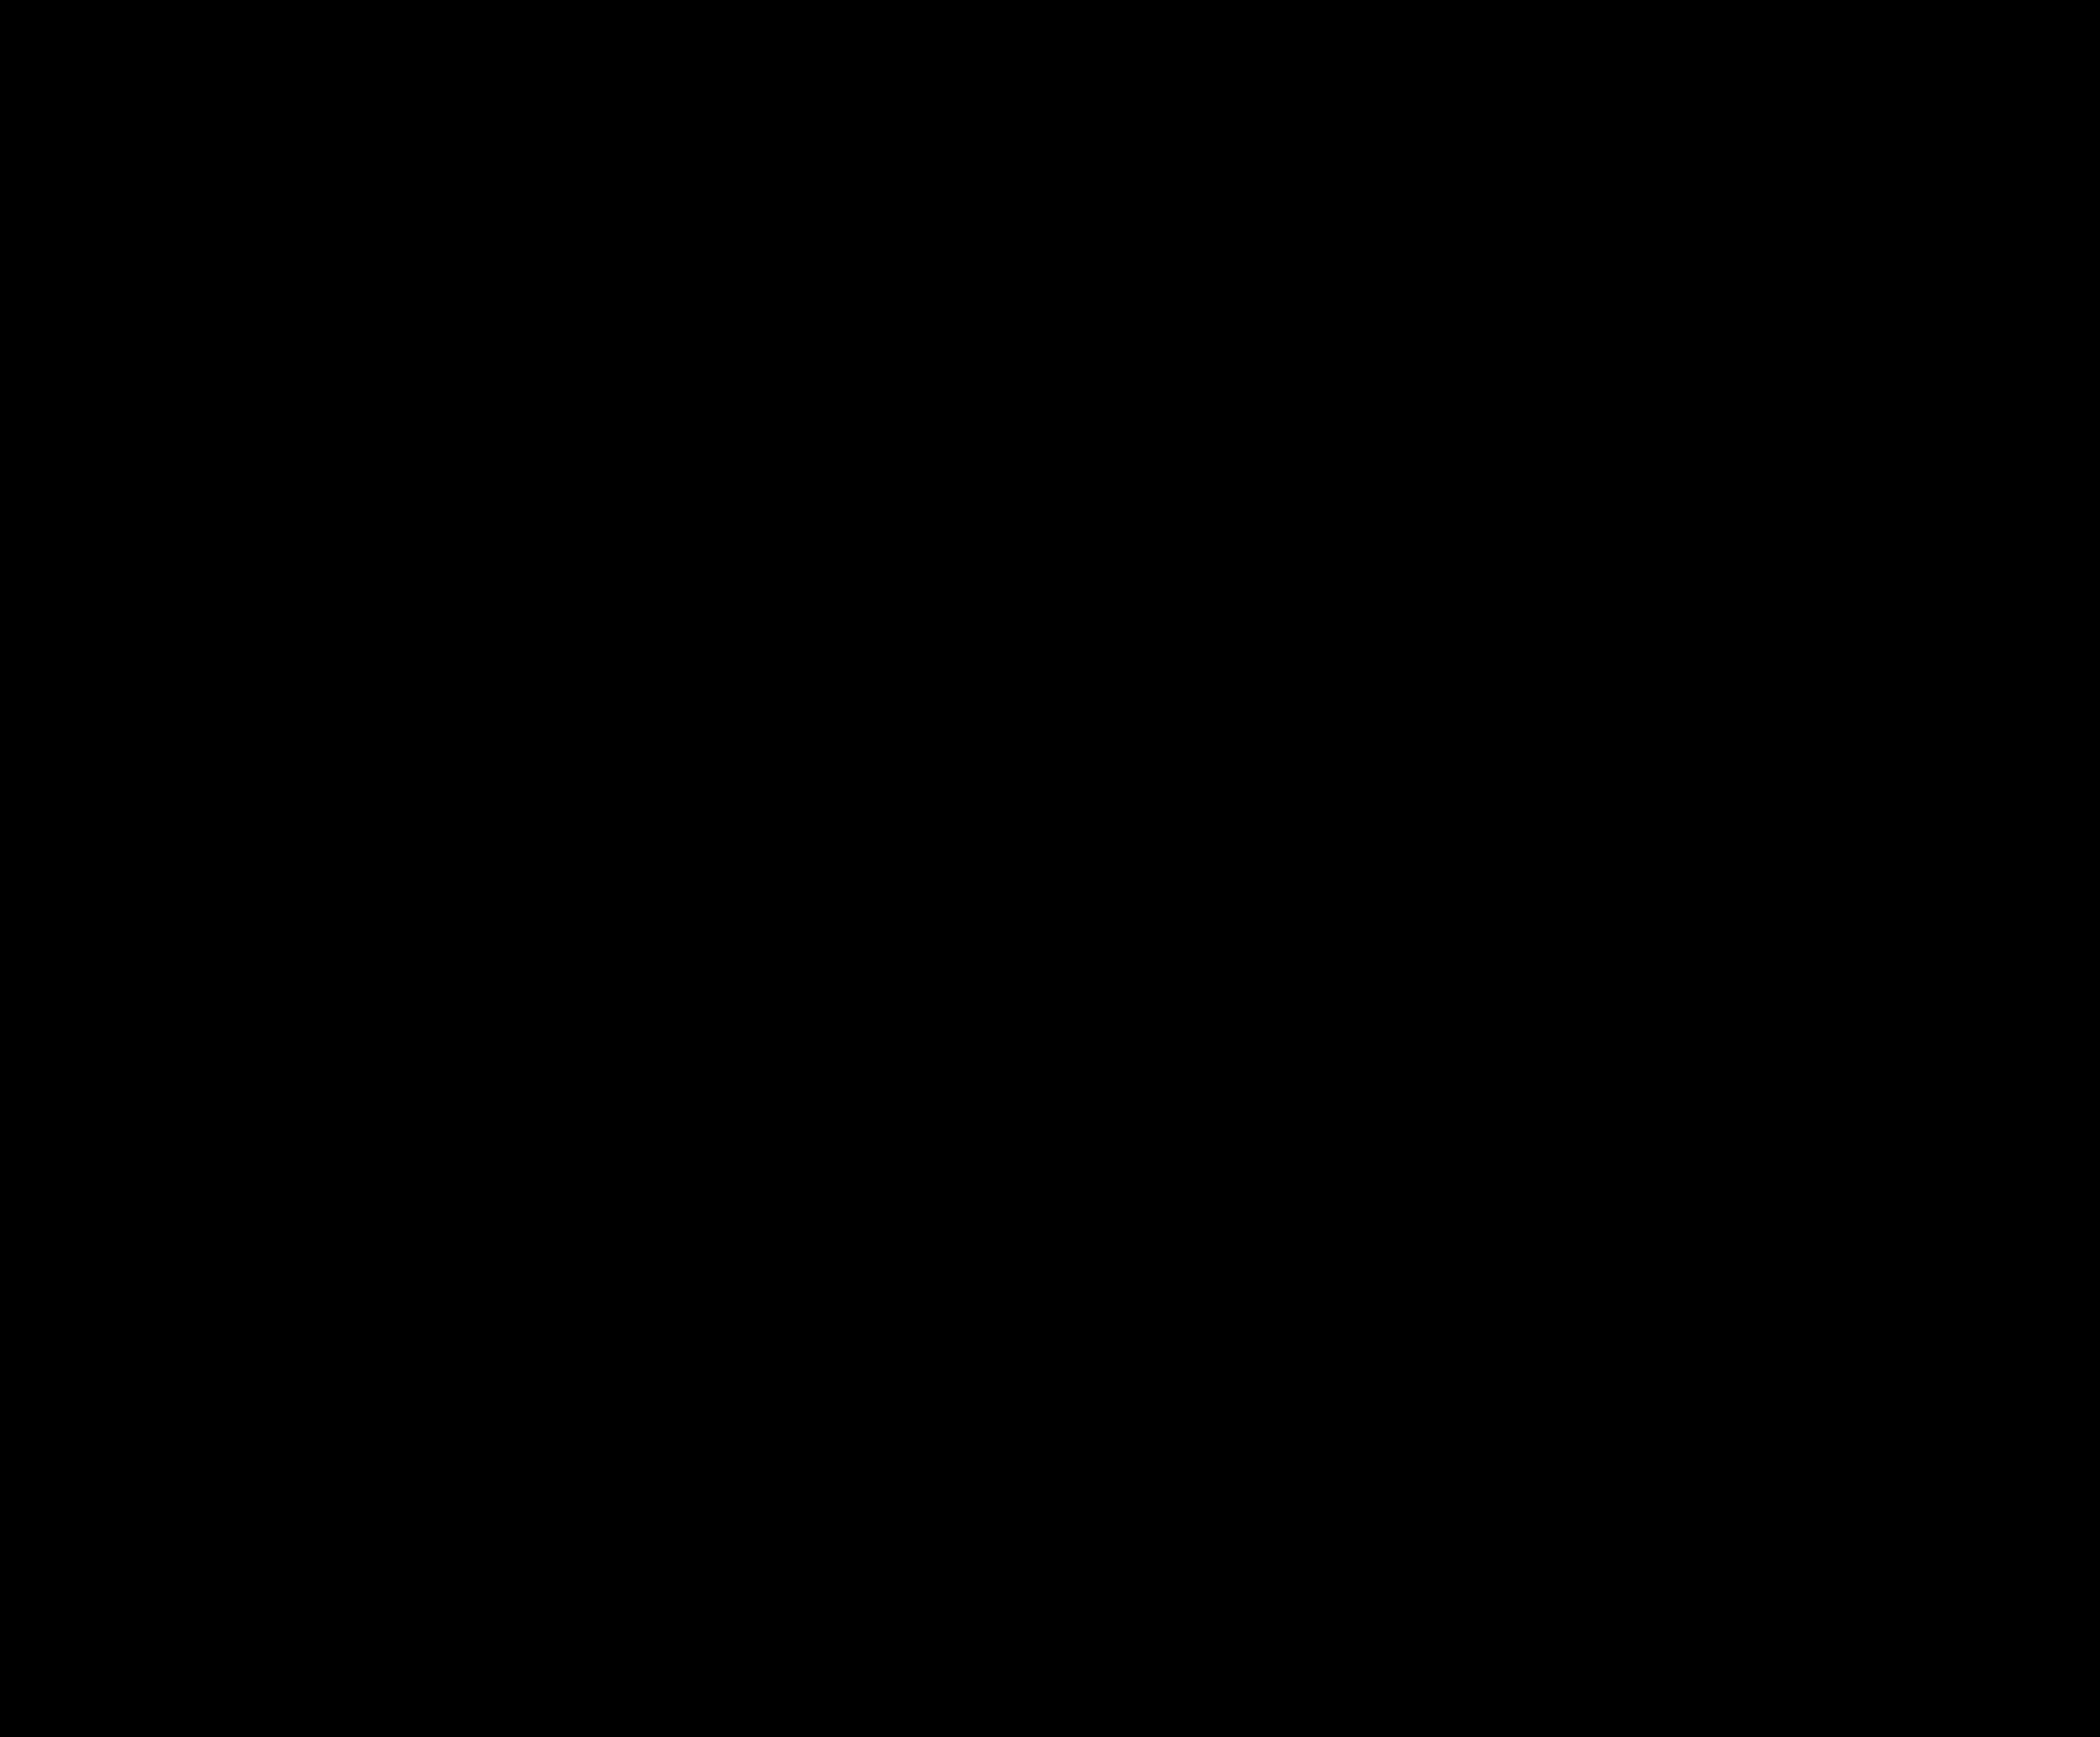 wallexhibit-01.png